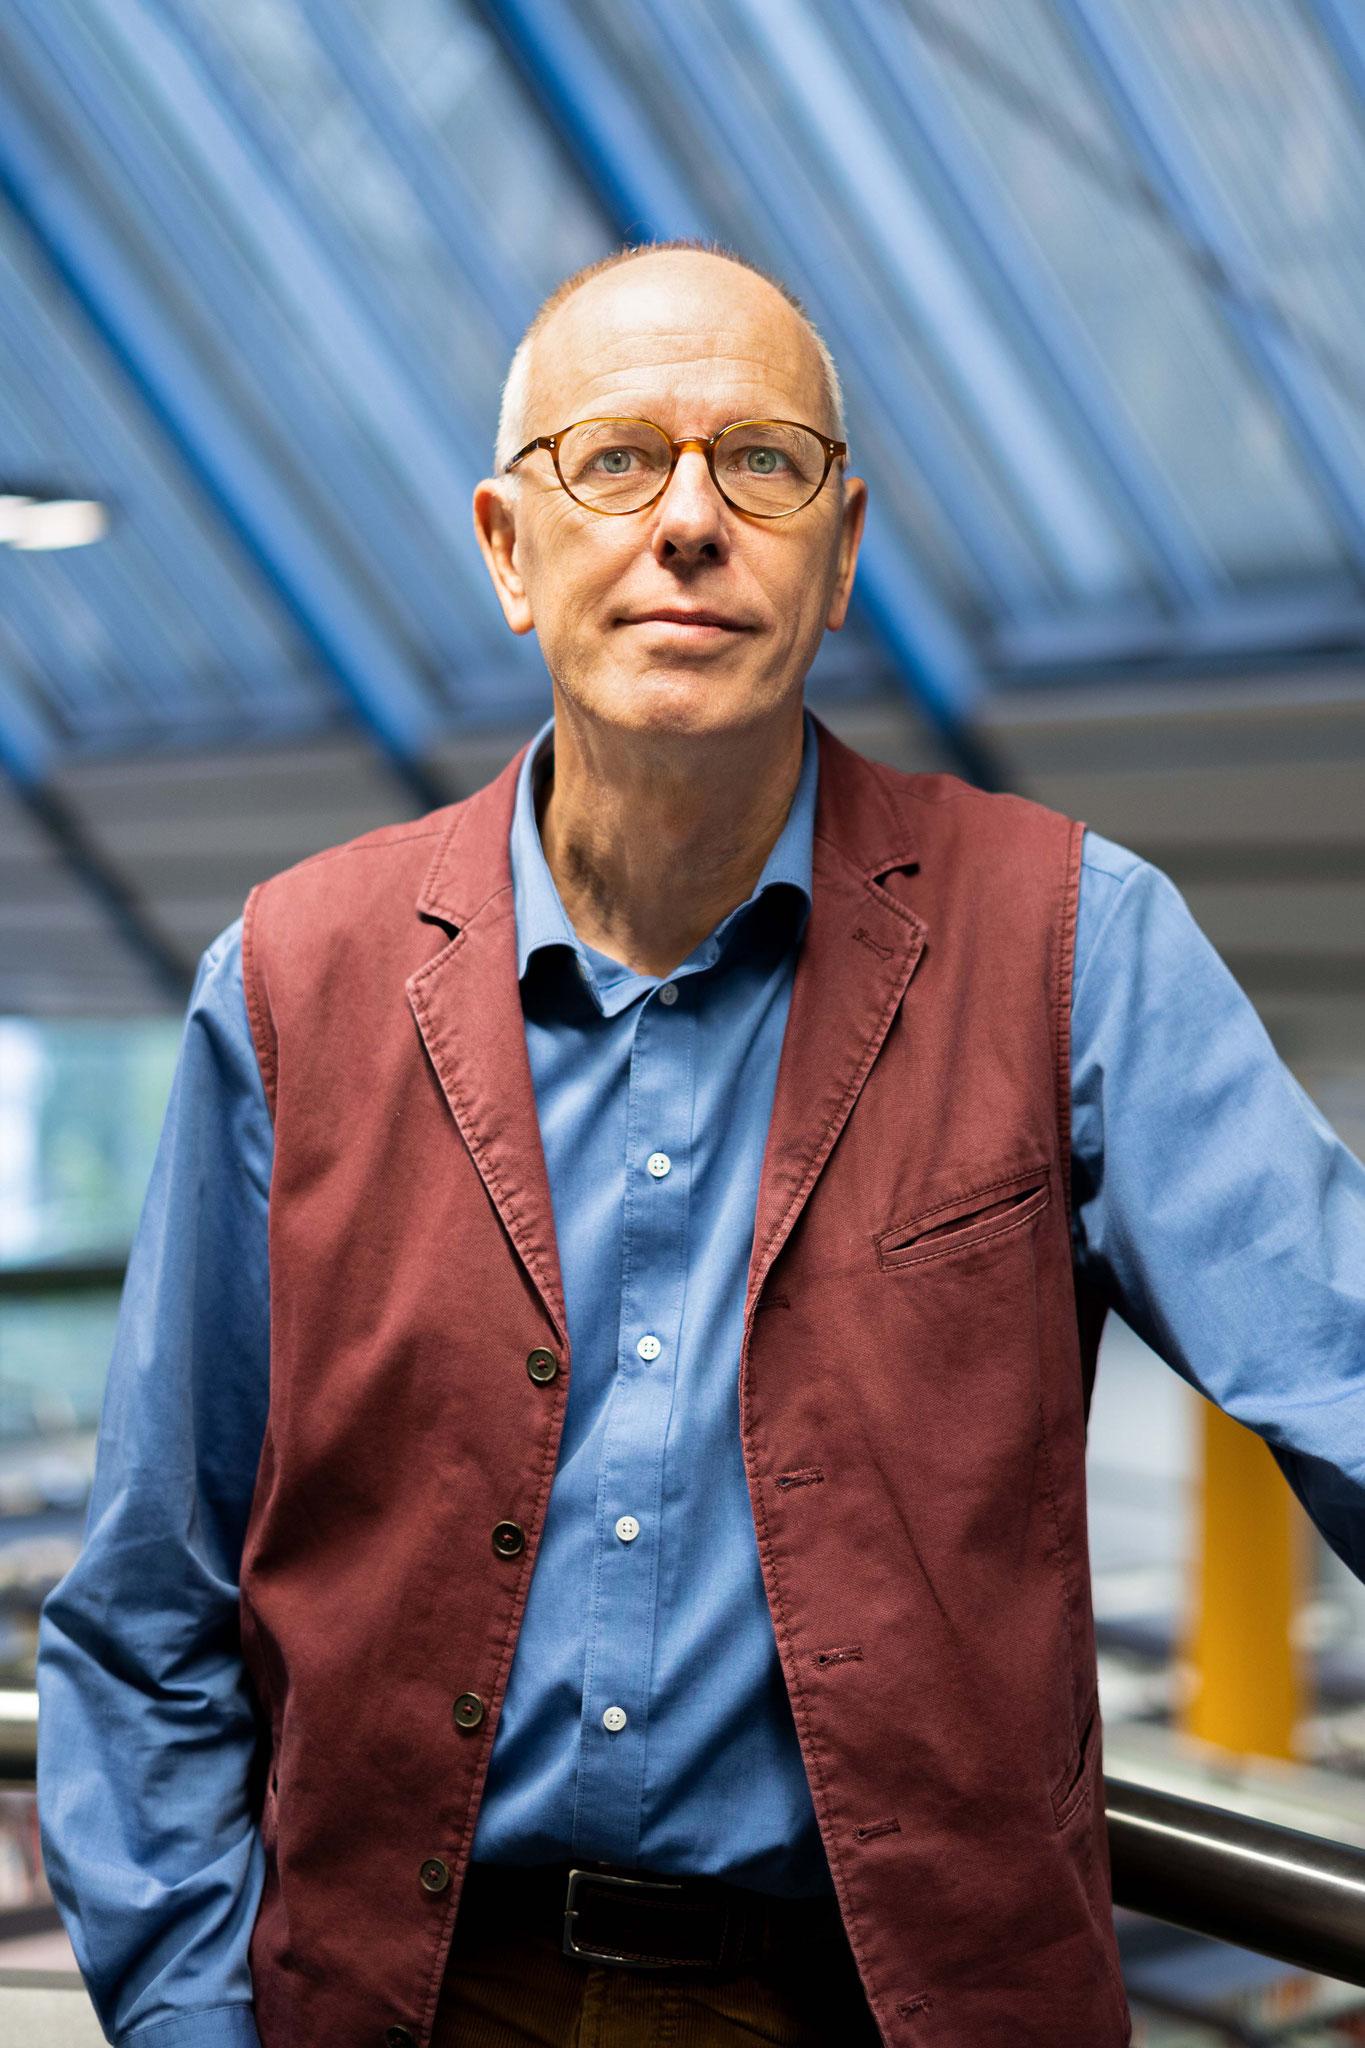 Prof. Dr. Lutz Raphael